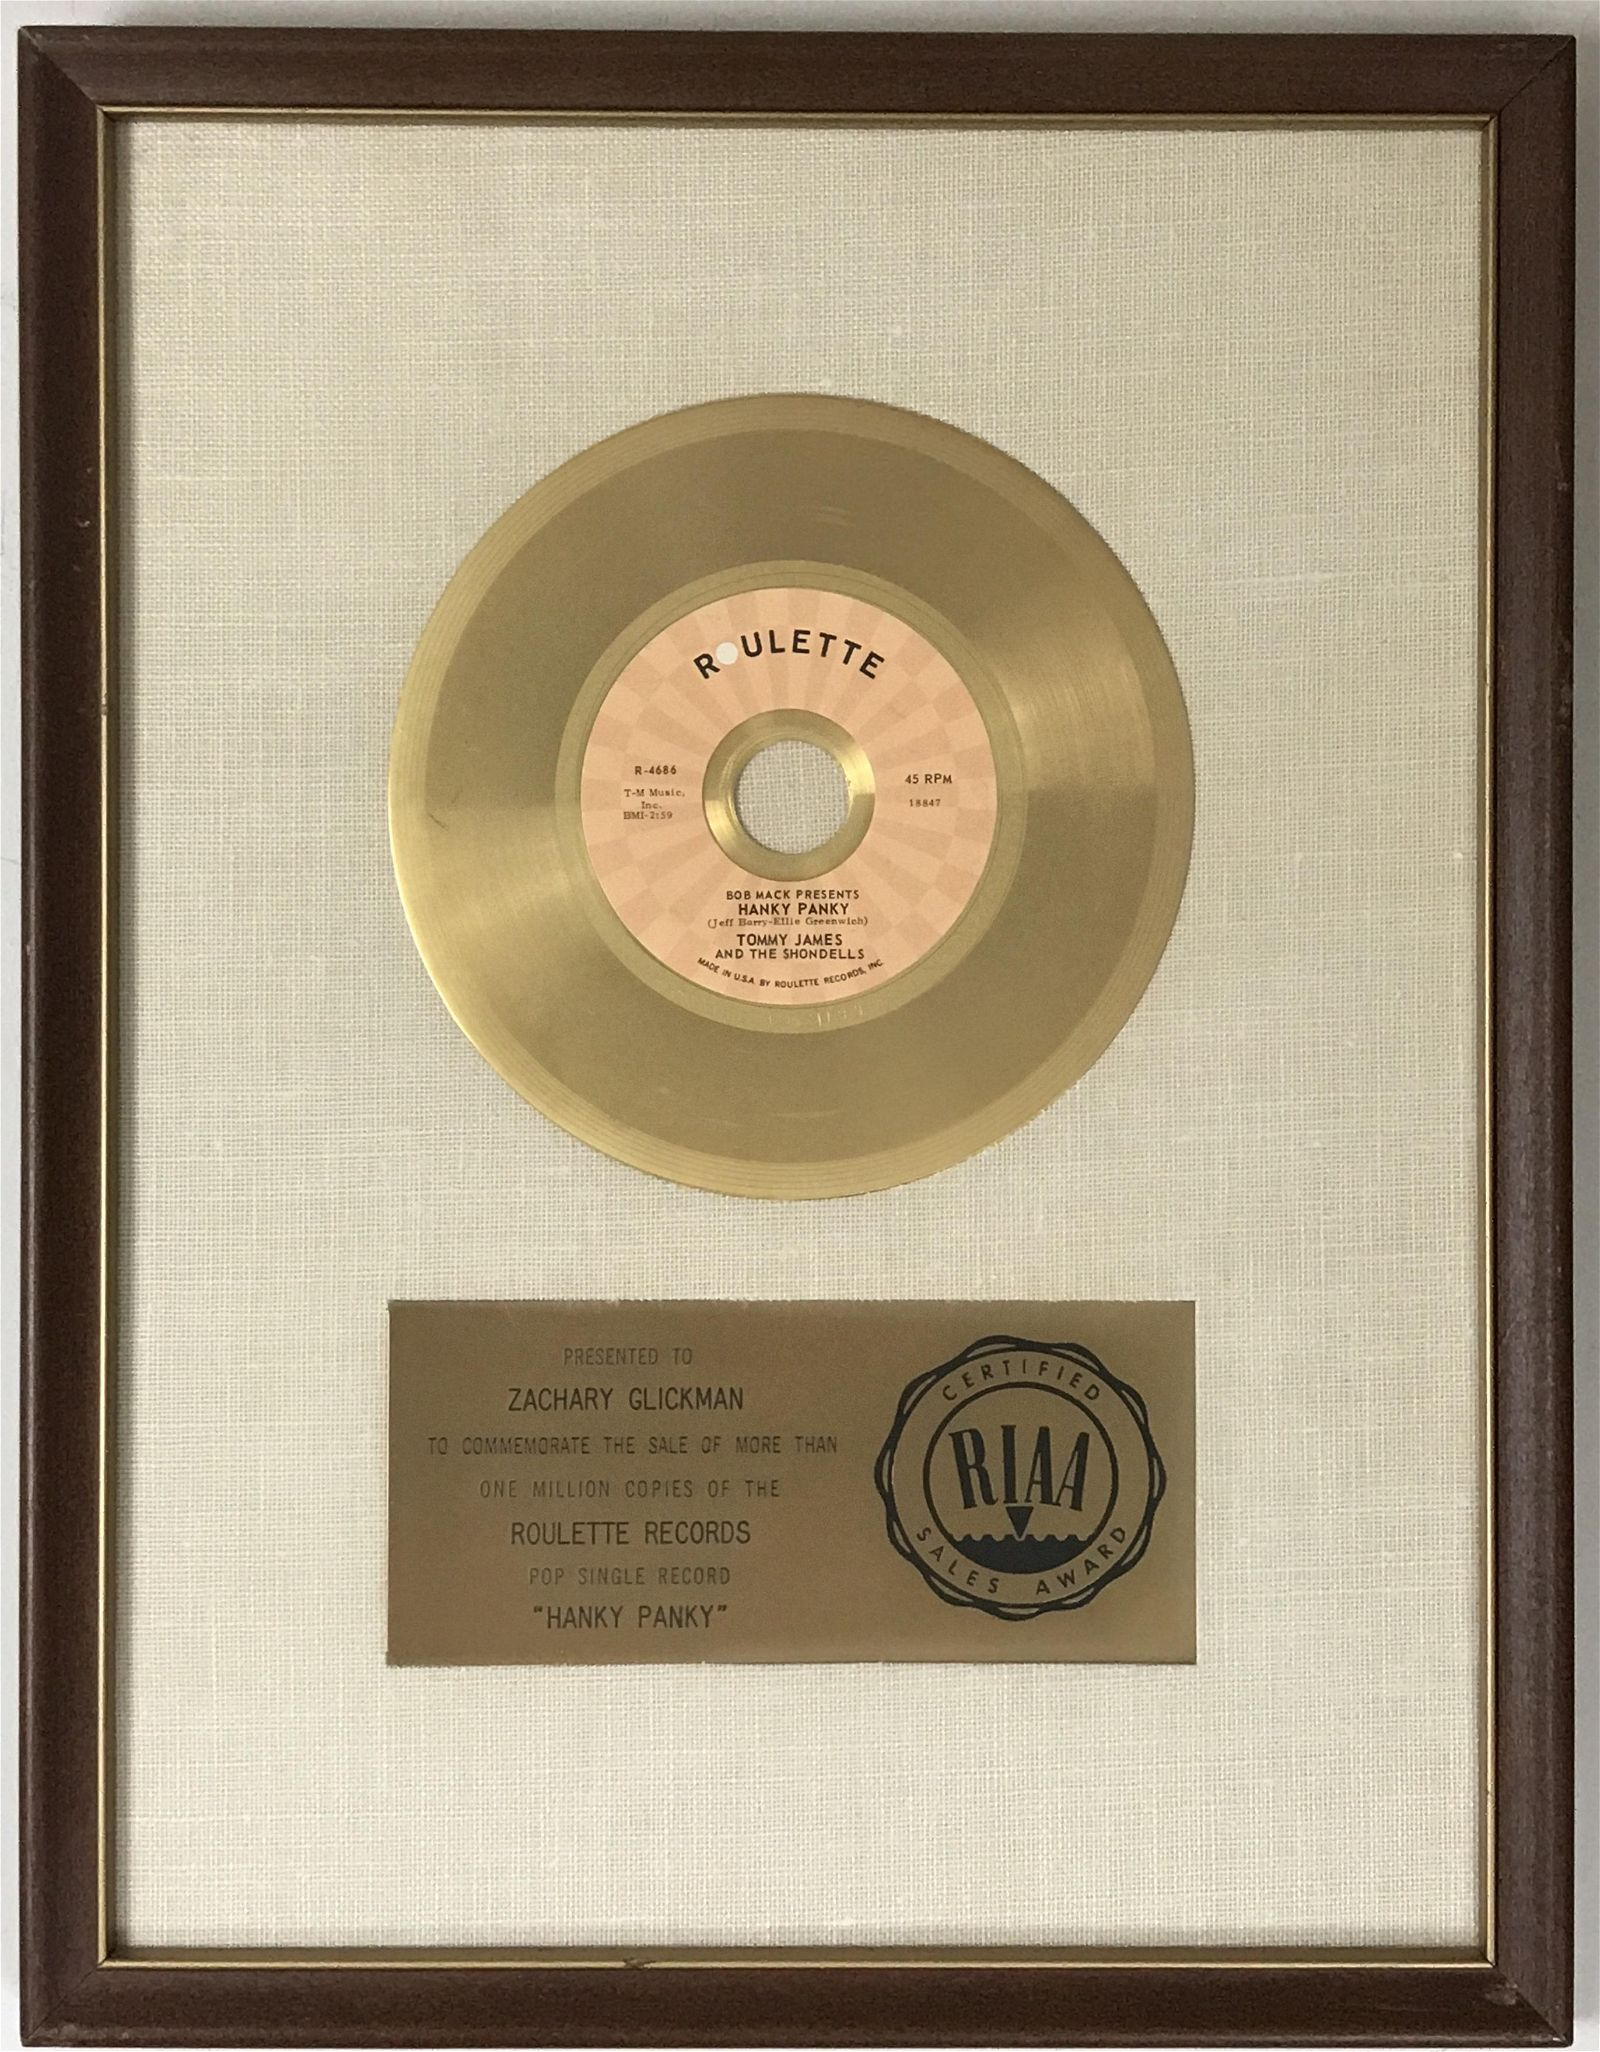 "Tommy James & the Shondells ""Hanky Panky"" RIAA Gold"